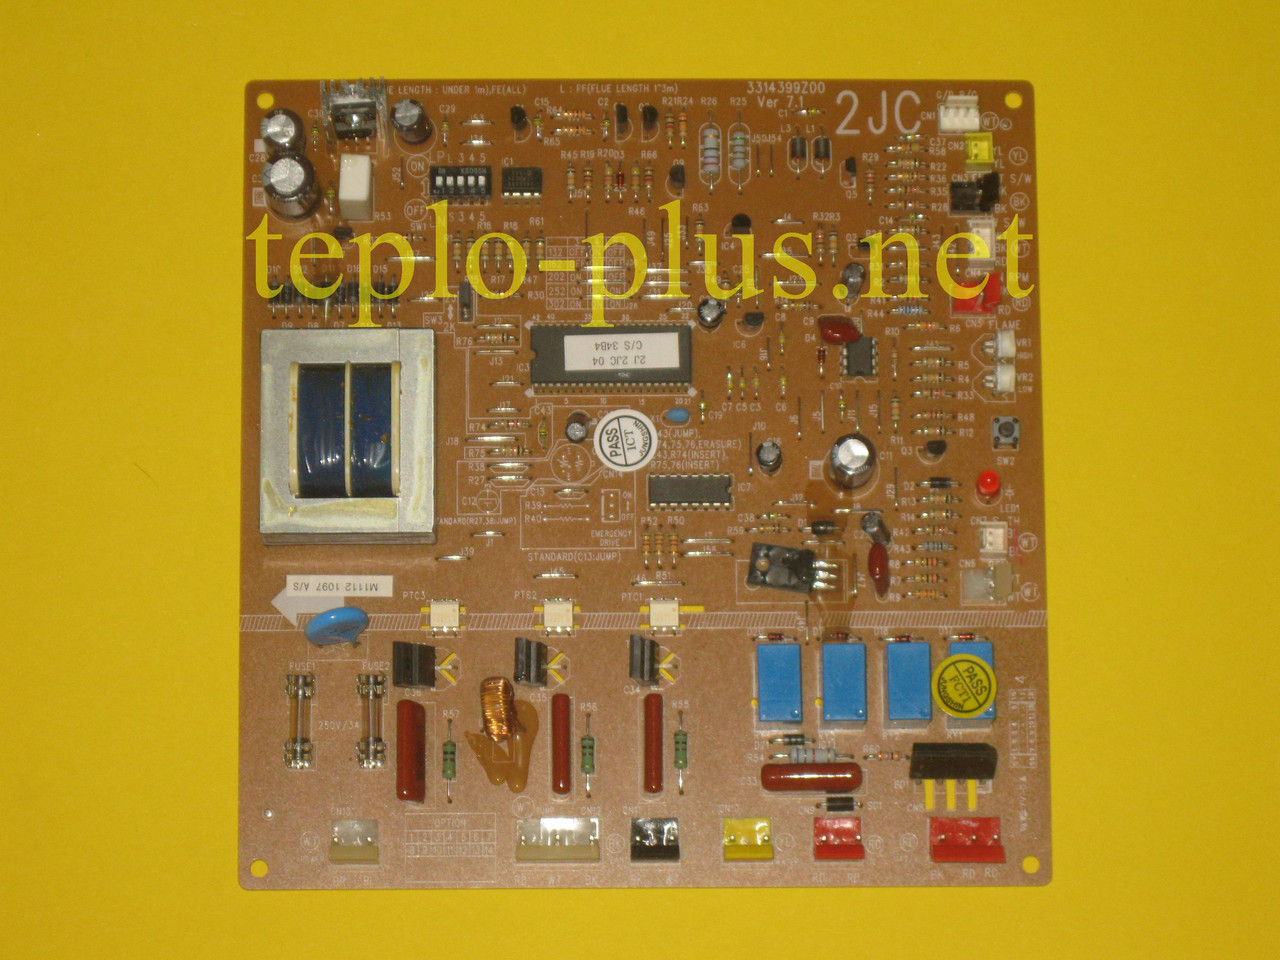 Блок (плата) управления 2JC-TOTAL 3314399Y00 Daewoo Gasboiler DGB-130, 160, 200 ICH, 250, 300 KFC